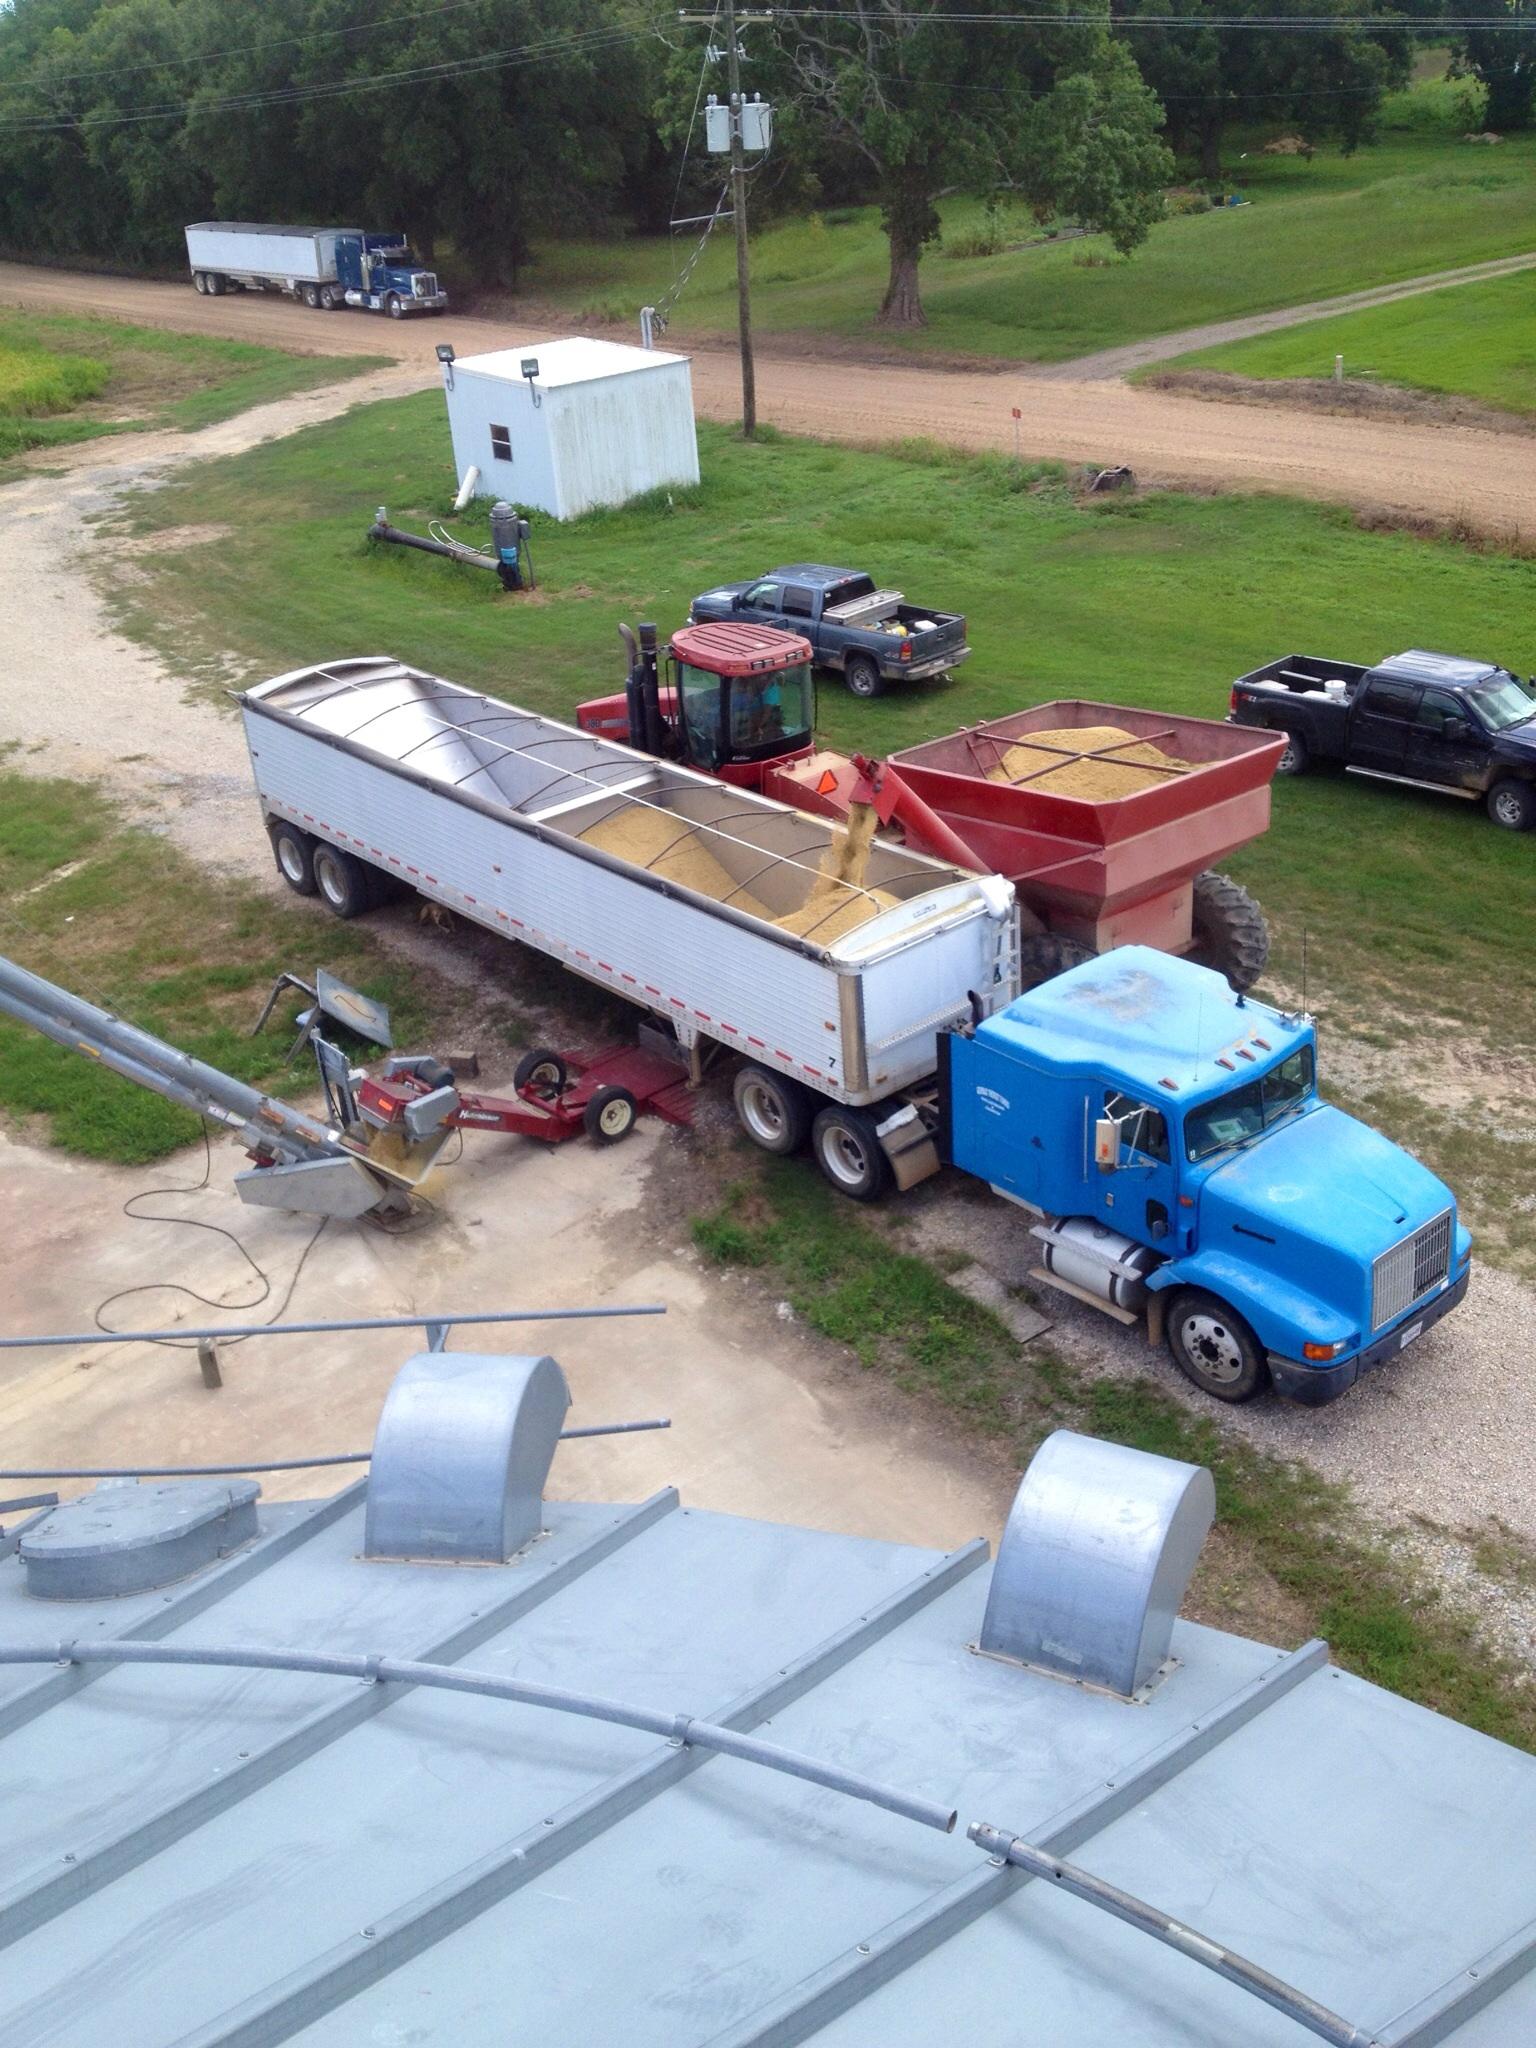 On top of the bins unloading trucks